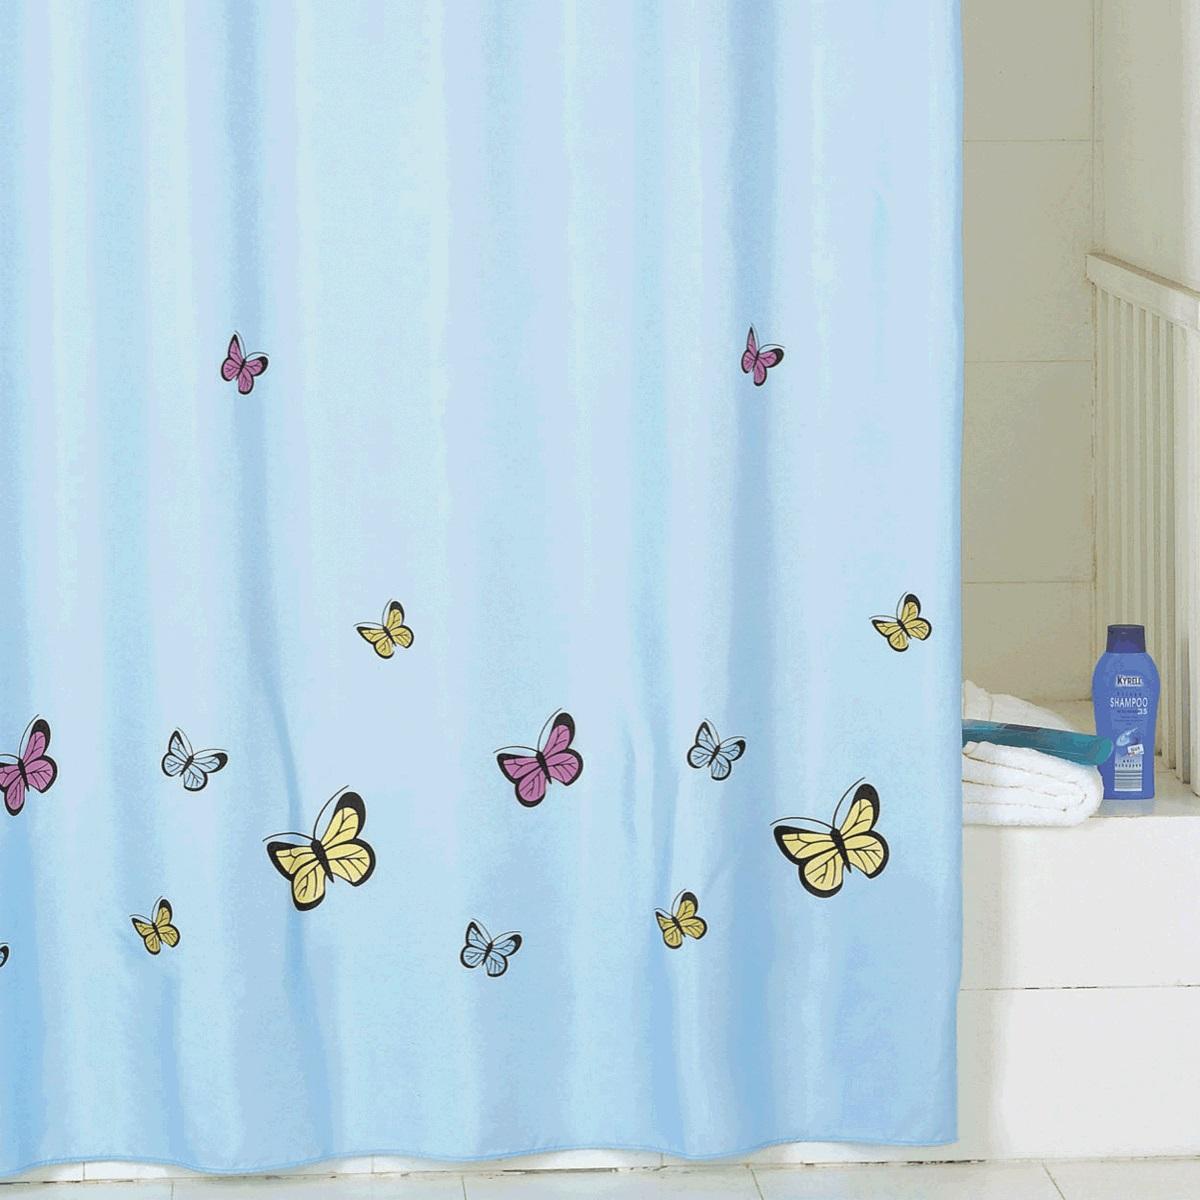 Штора для ванной Iddis Blue Butterfly, цвет: голубой, 200 x 200 см